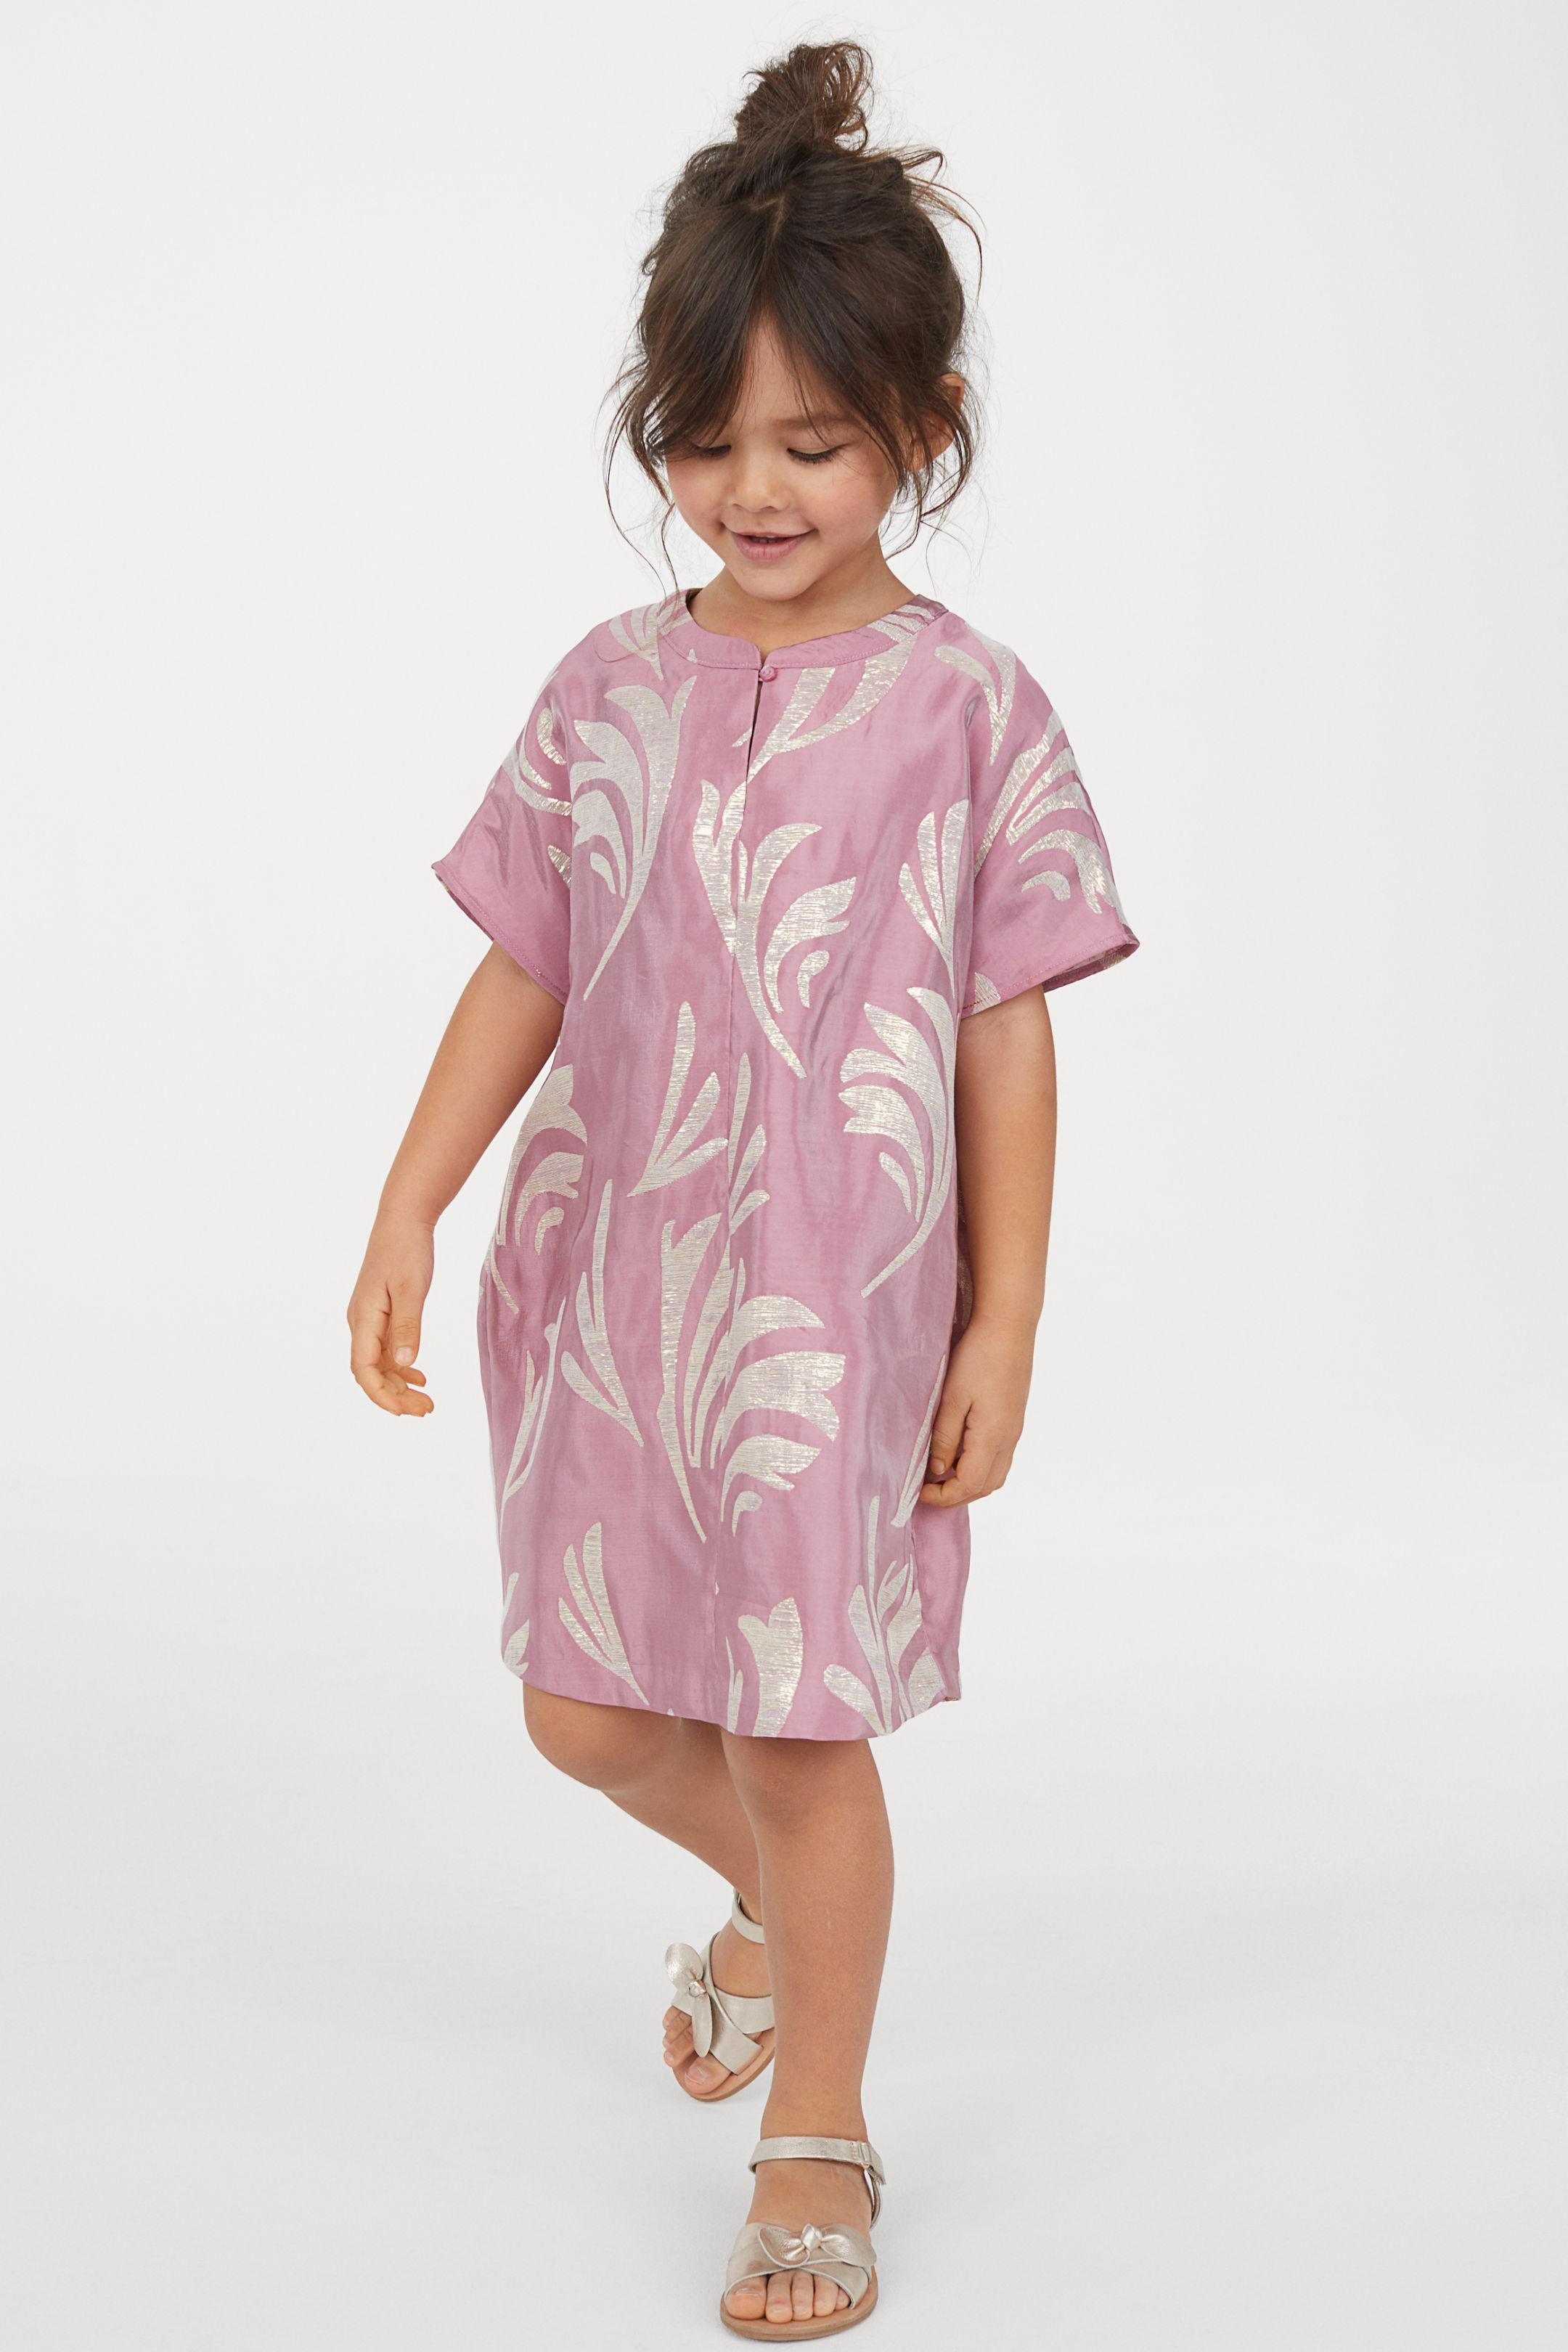 H&M girl's tunic